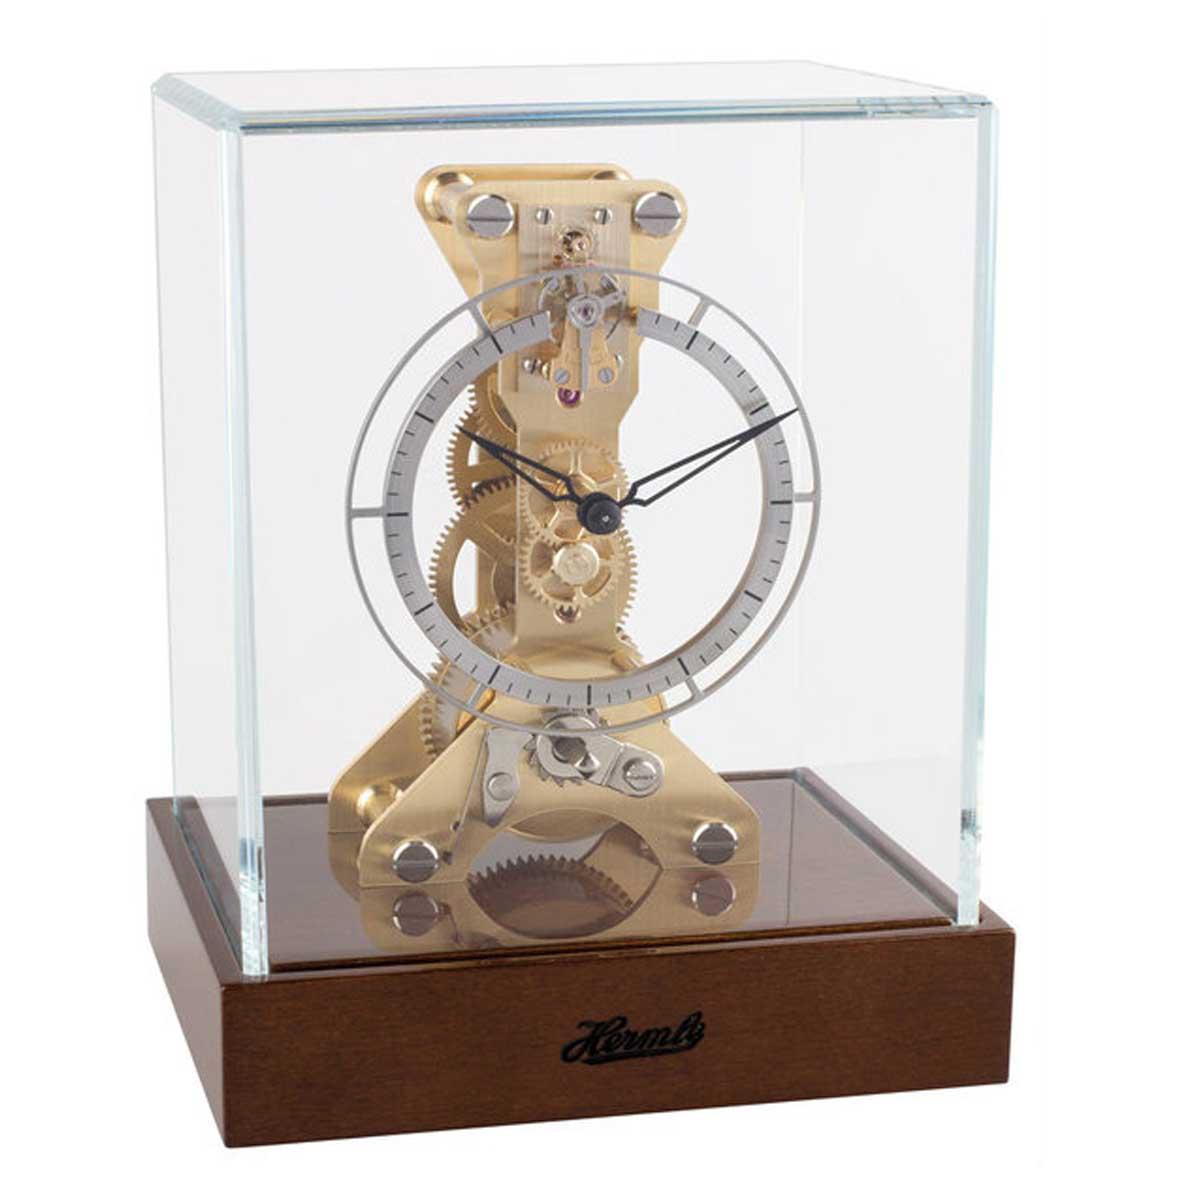 ALFORD 23047-020762   Skeleton Mantel Clock Walnut